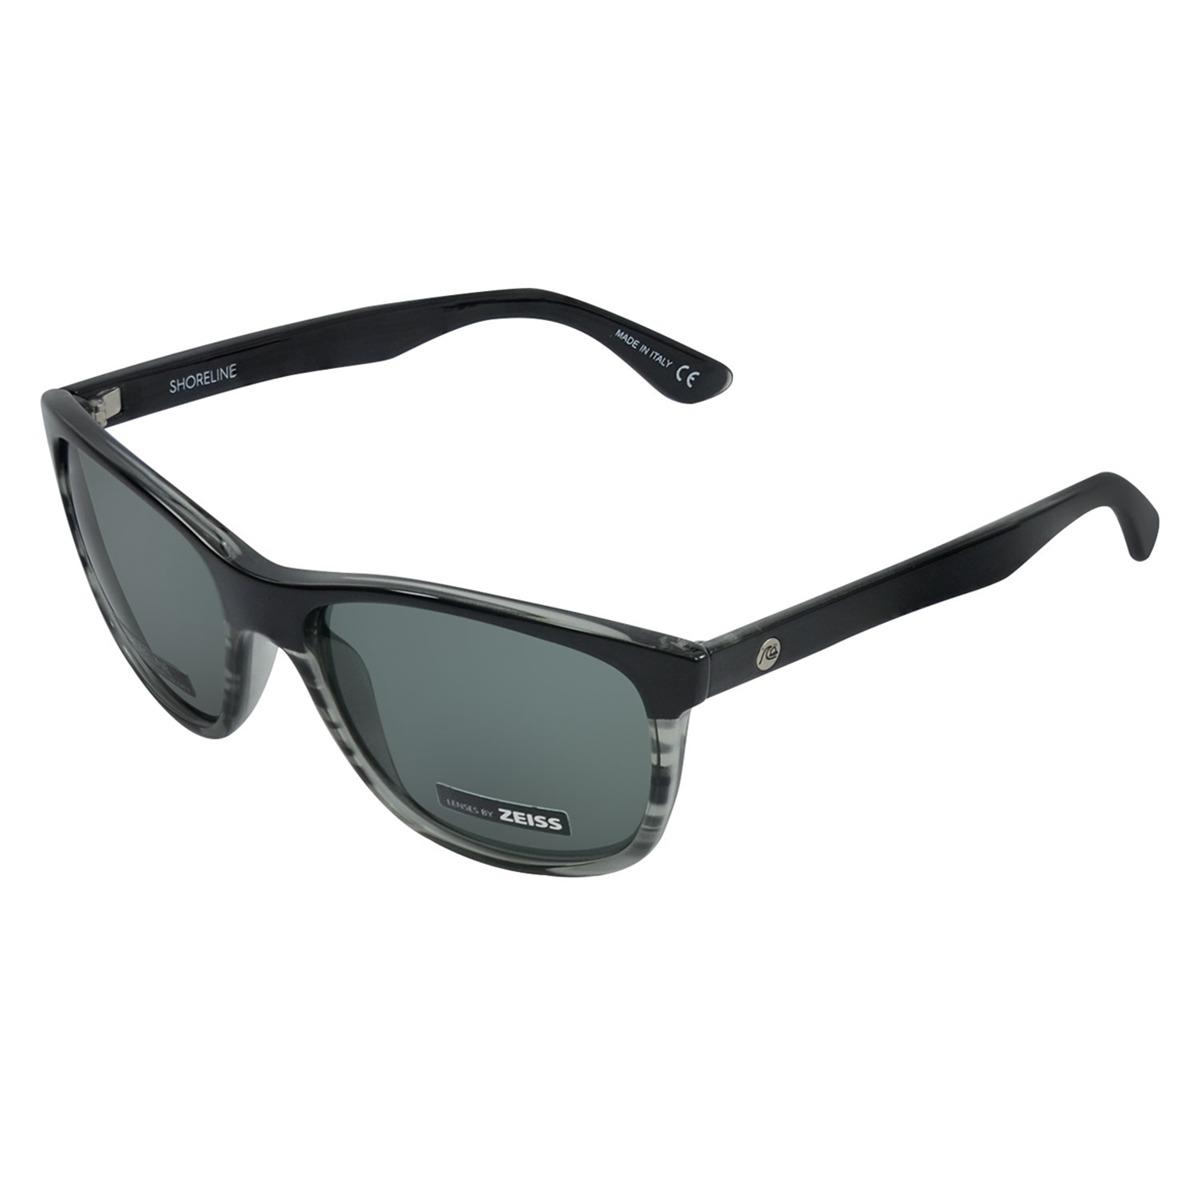 Óculos Masculino Quiksilver Shoreline I14 Preto - R  490,00 em ... ec6f1f7cb2